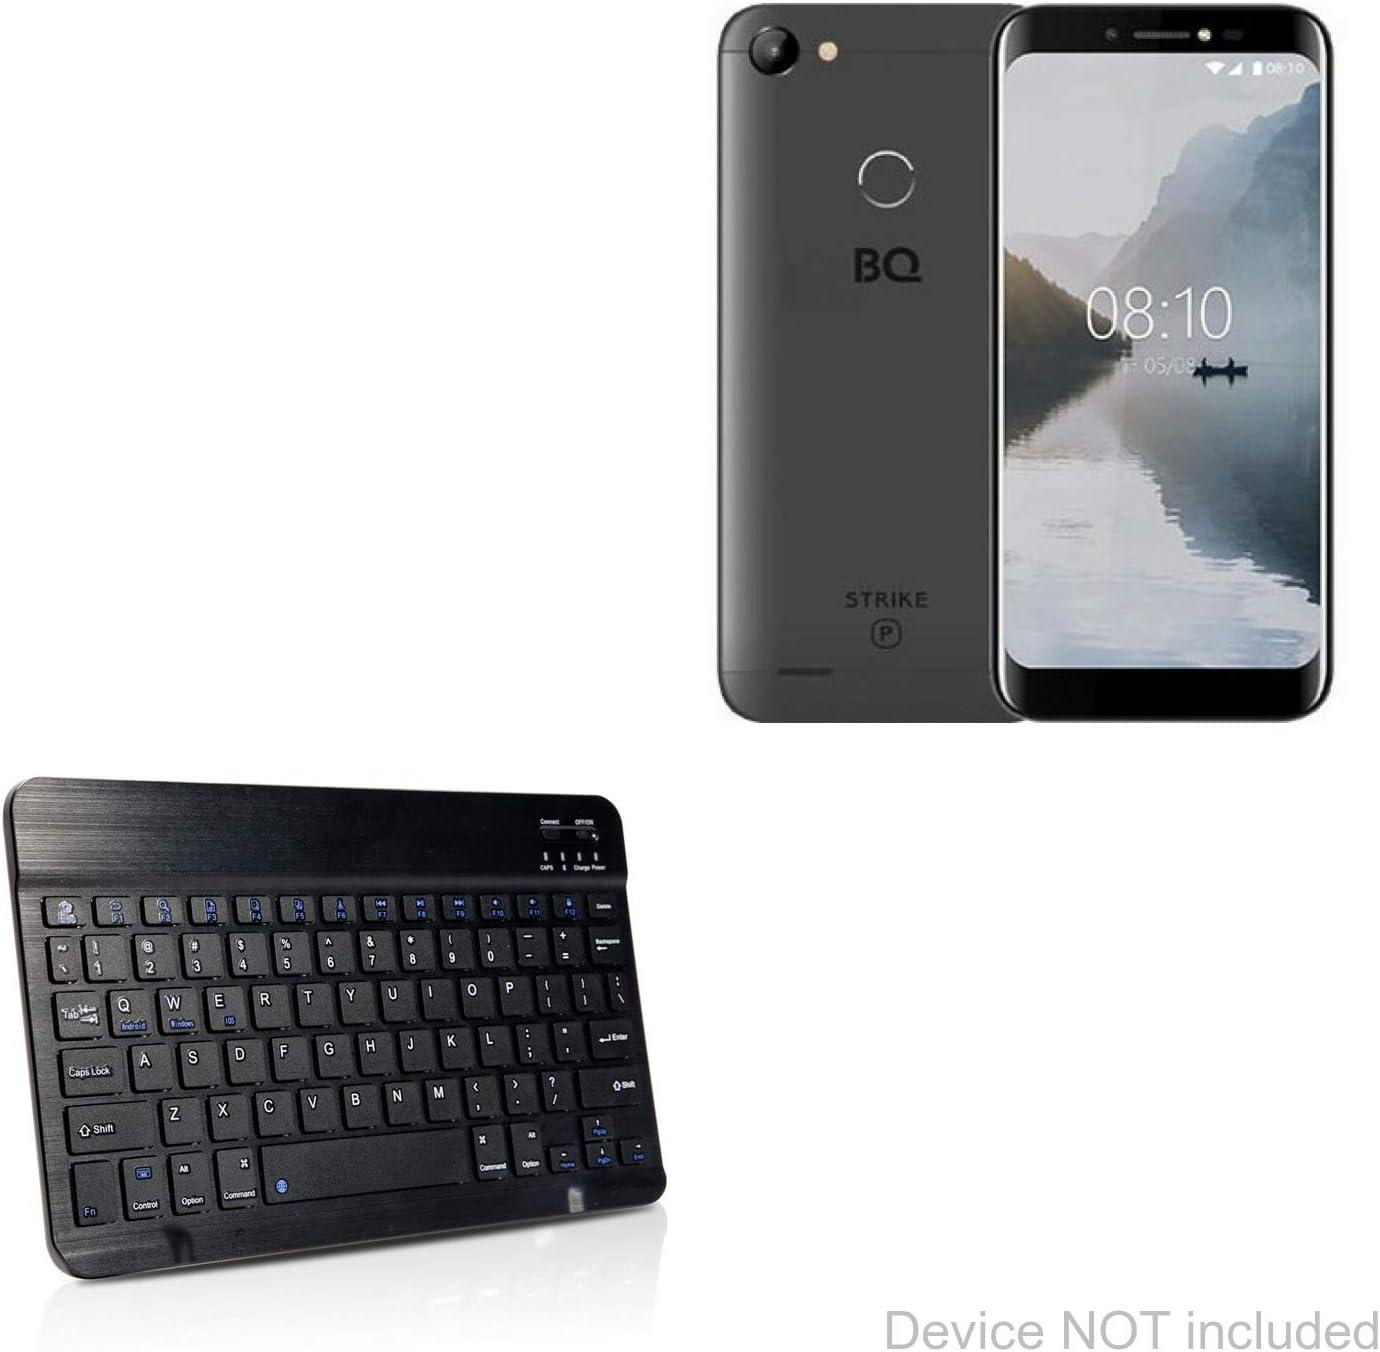 SlimKeys Bluetooth Keyboard BoxWave BQ Mobile BQ-5514G Strike Power Keyboard Jet Black Portable Keyboard with Integrated Commands for BQ Mobile BQ-5514G Strike Power